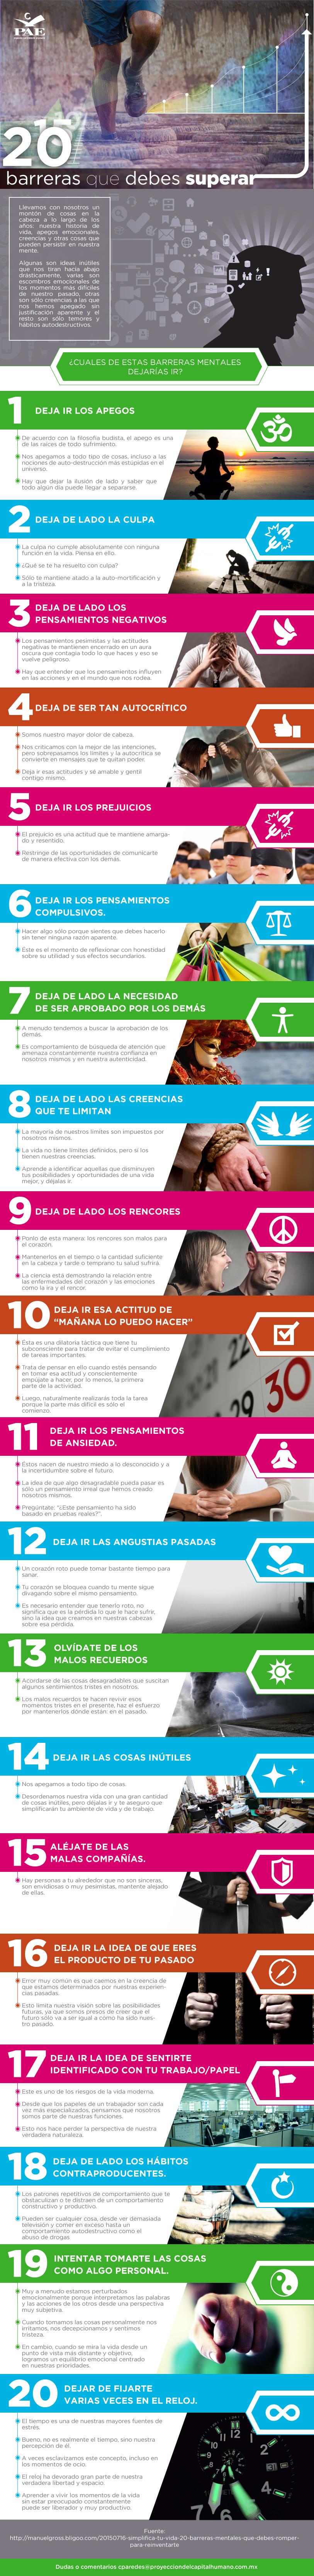 #PAEMX 20 Barreras que Debes Superar. Innovación Profesional